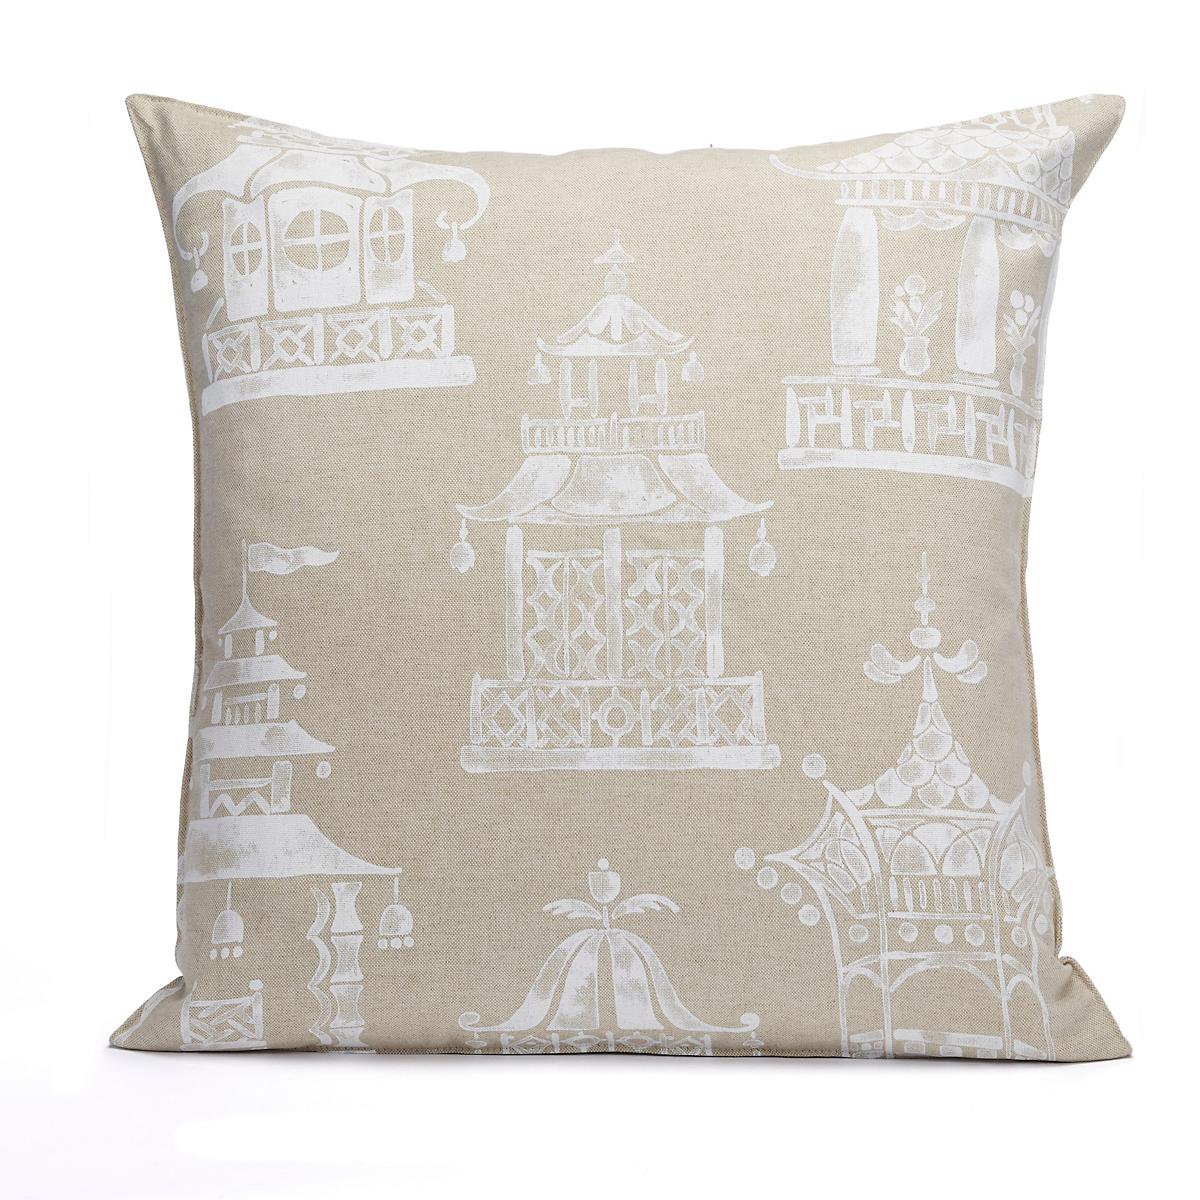 Teahouse Pagoda Pillow